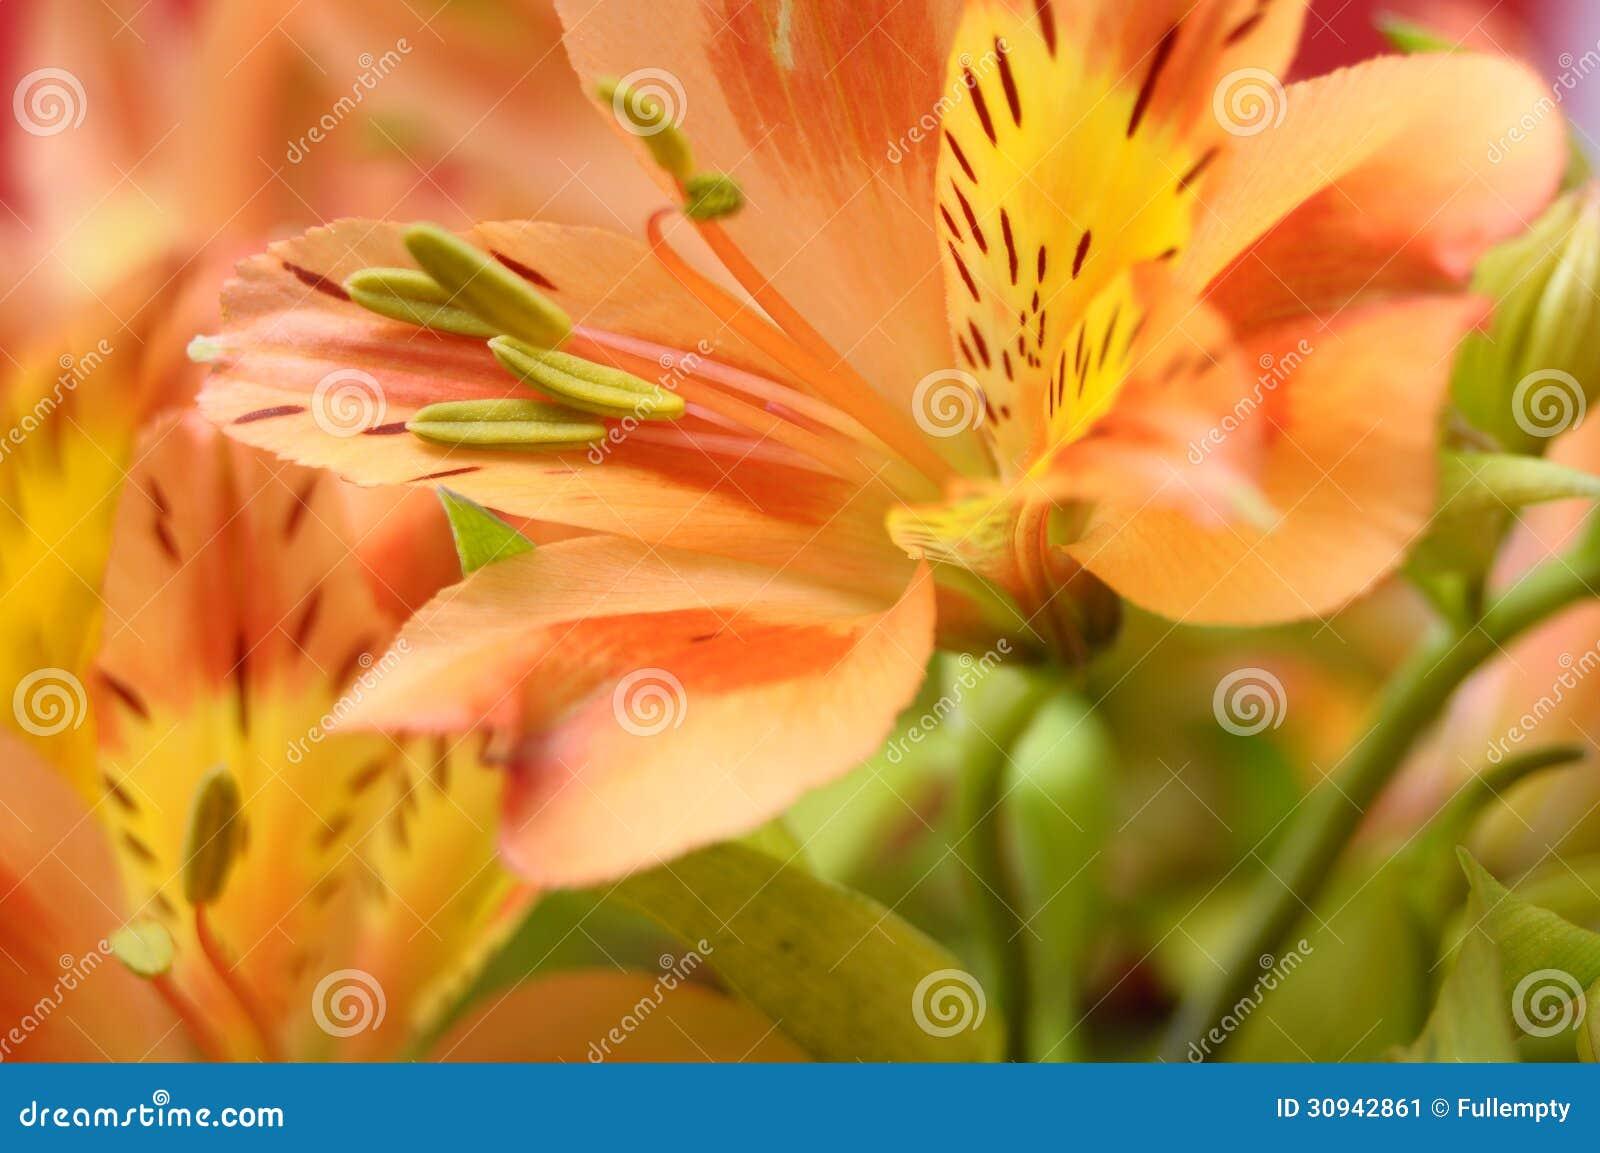 Closeup of orange peruvian lily flower stock image image of royalty free stock photo izmirmasajfo Gallery